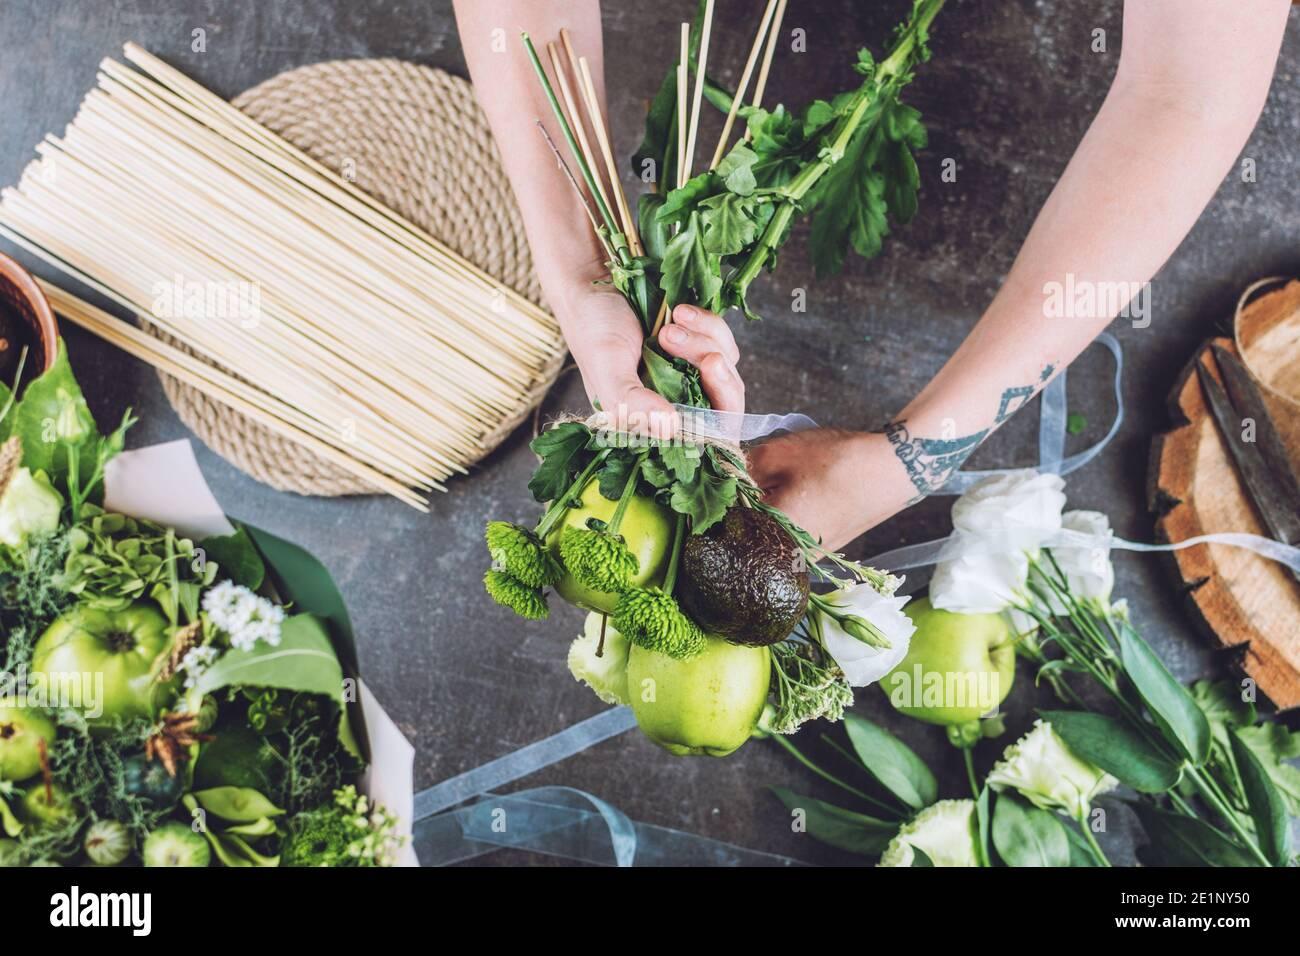 Hobbies and activities, arts and crafts during coronavirus. Florist woman make fruit edible bouquet. Naturalness, Flower Arranging, florist tricks Stock Photo